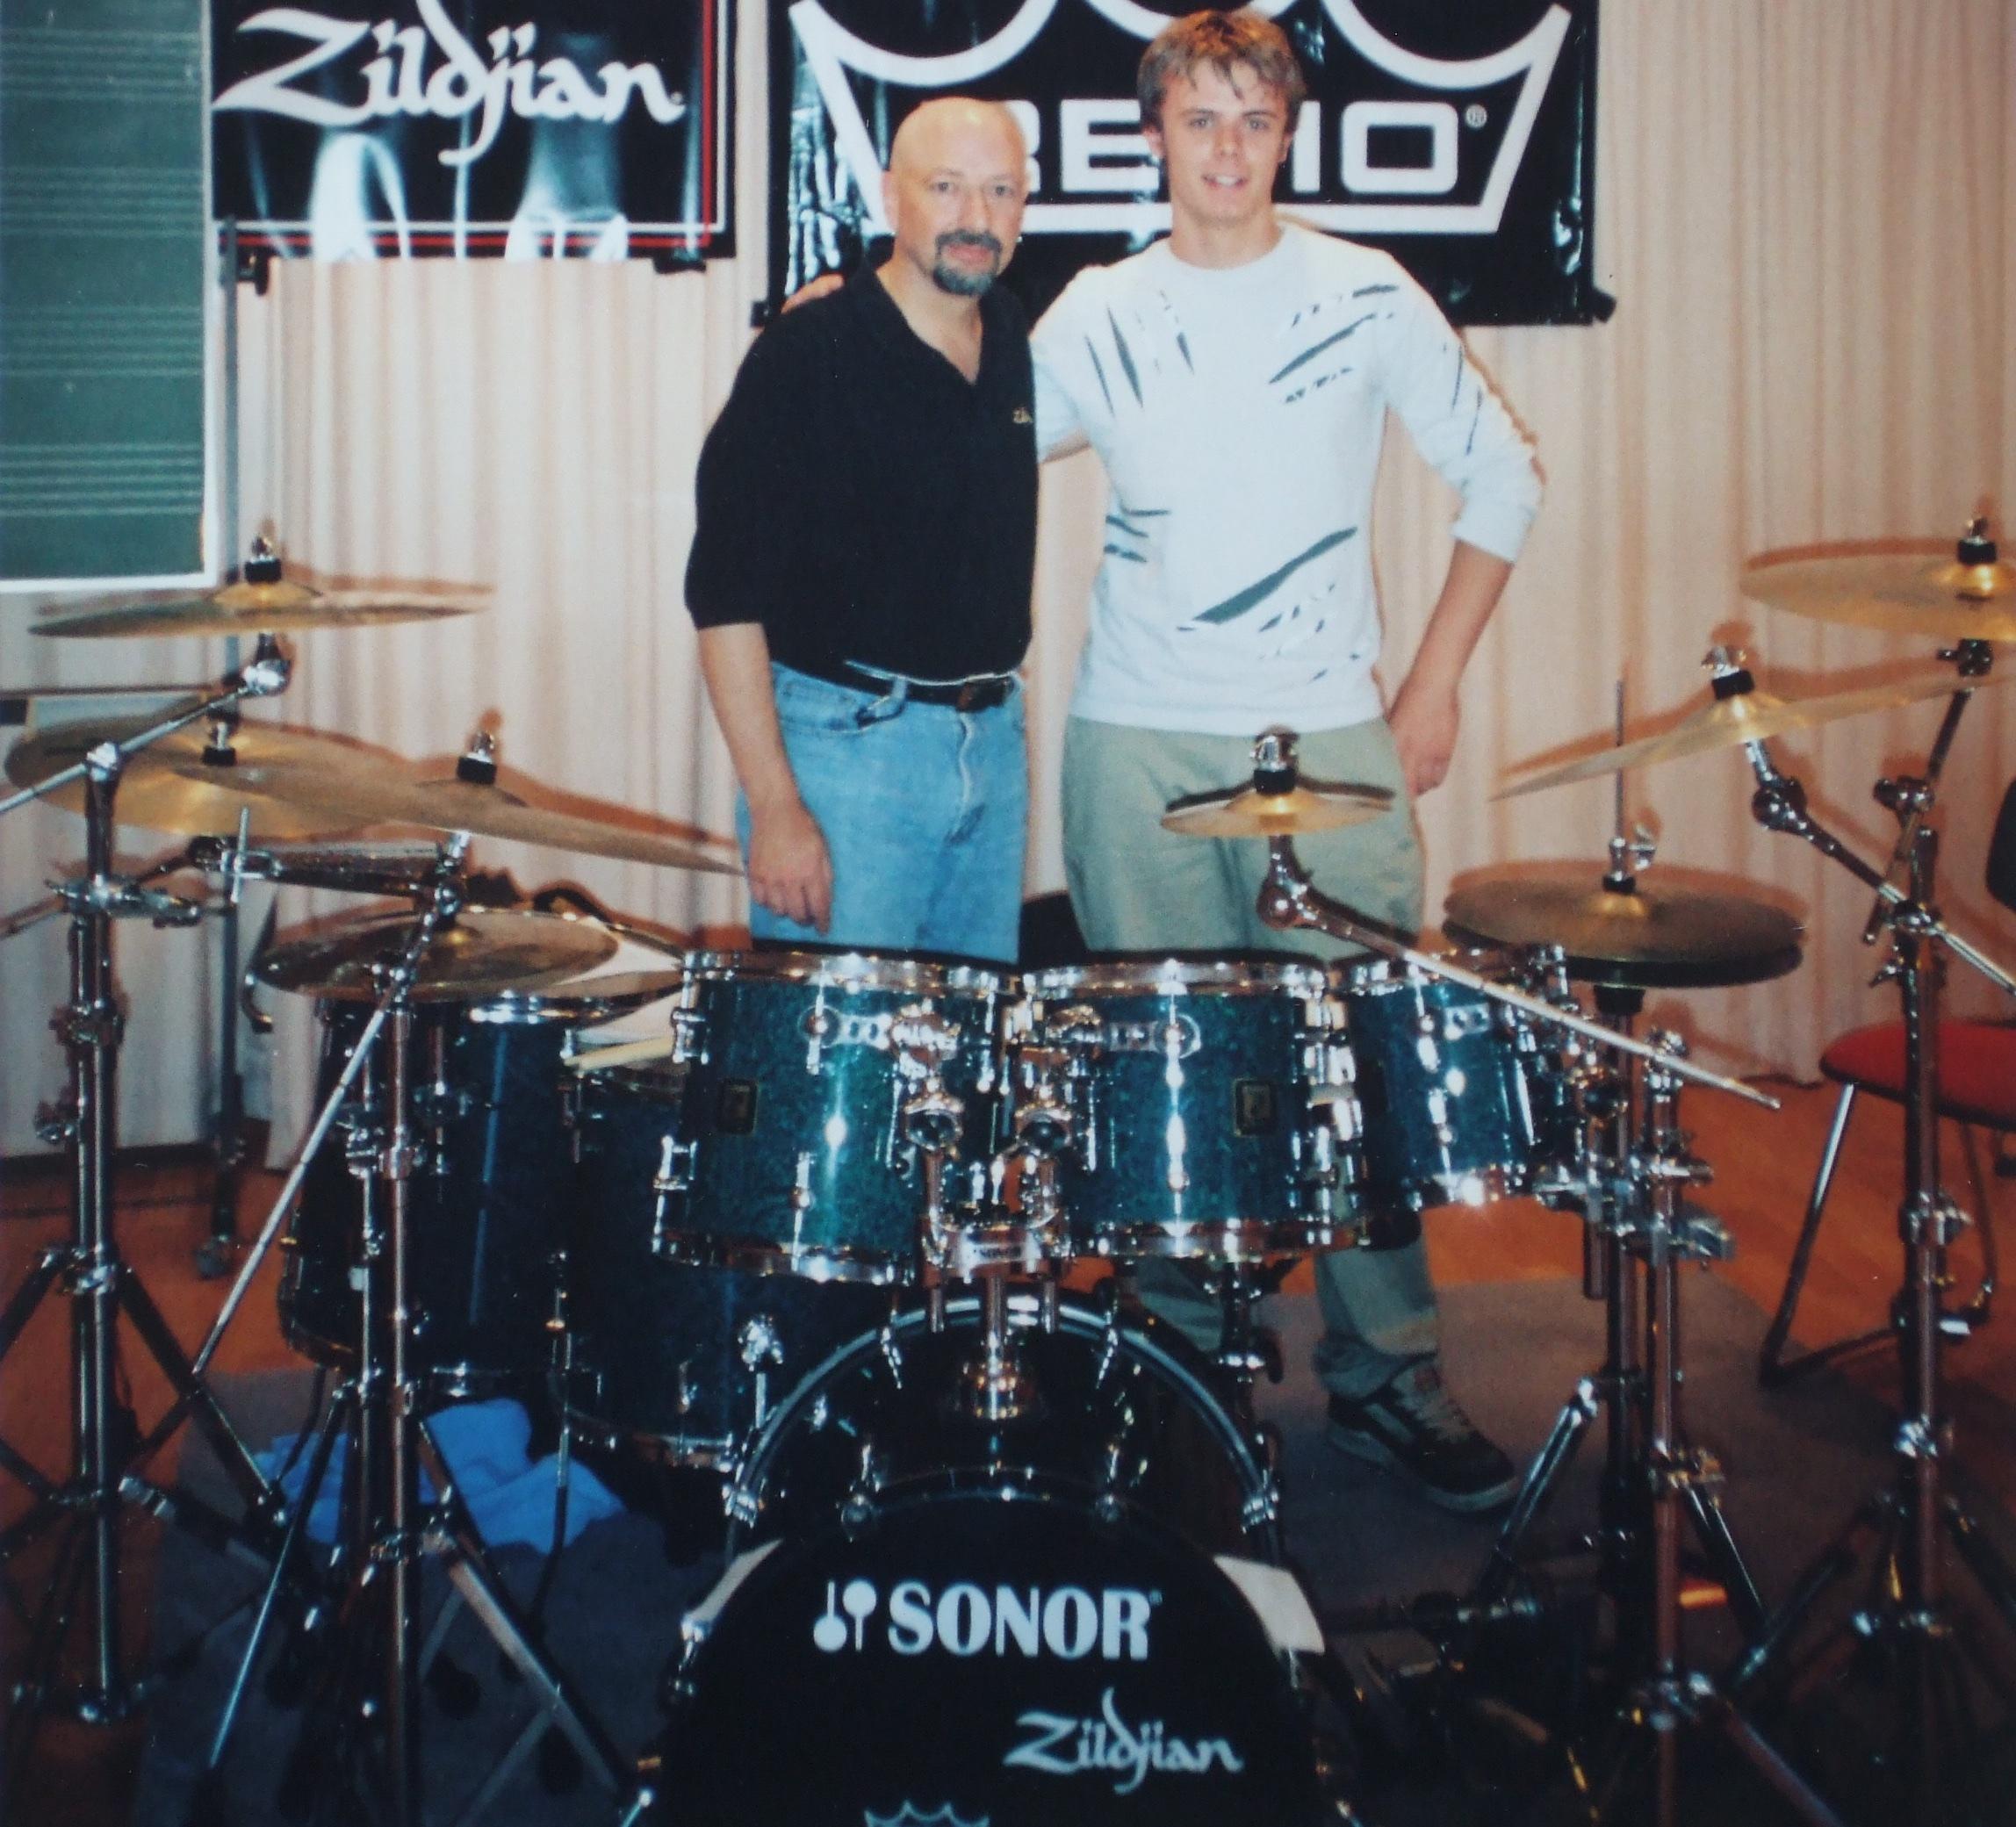 Ben, age 15, at Musikakademie Marktoberdorf,Germany,with Steve Smith.